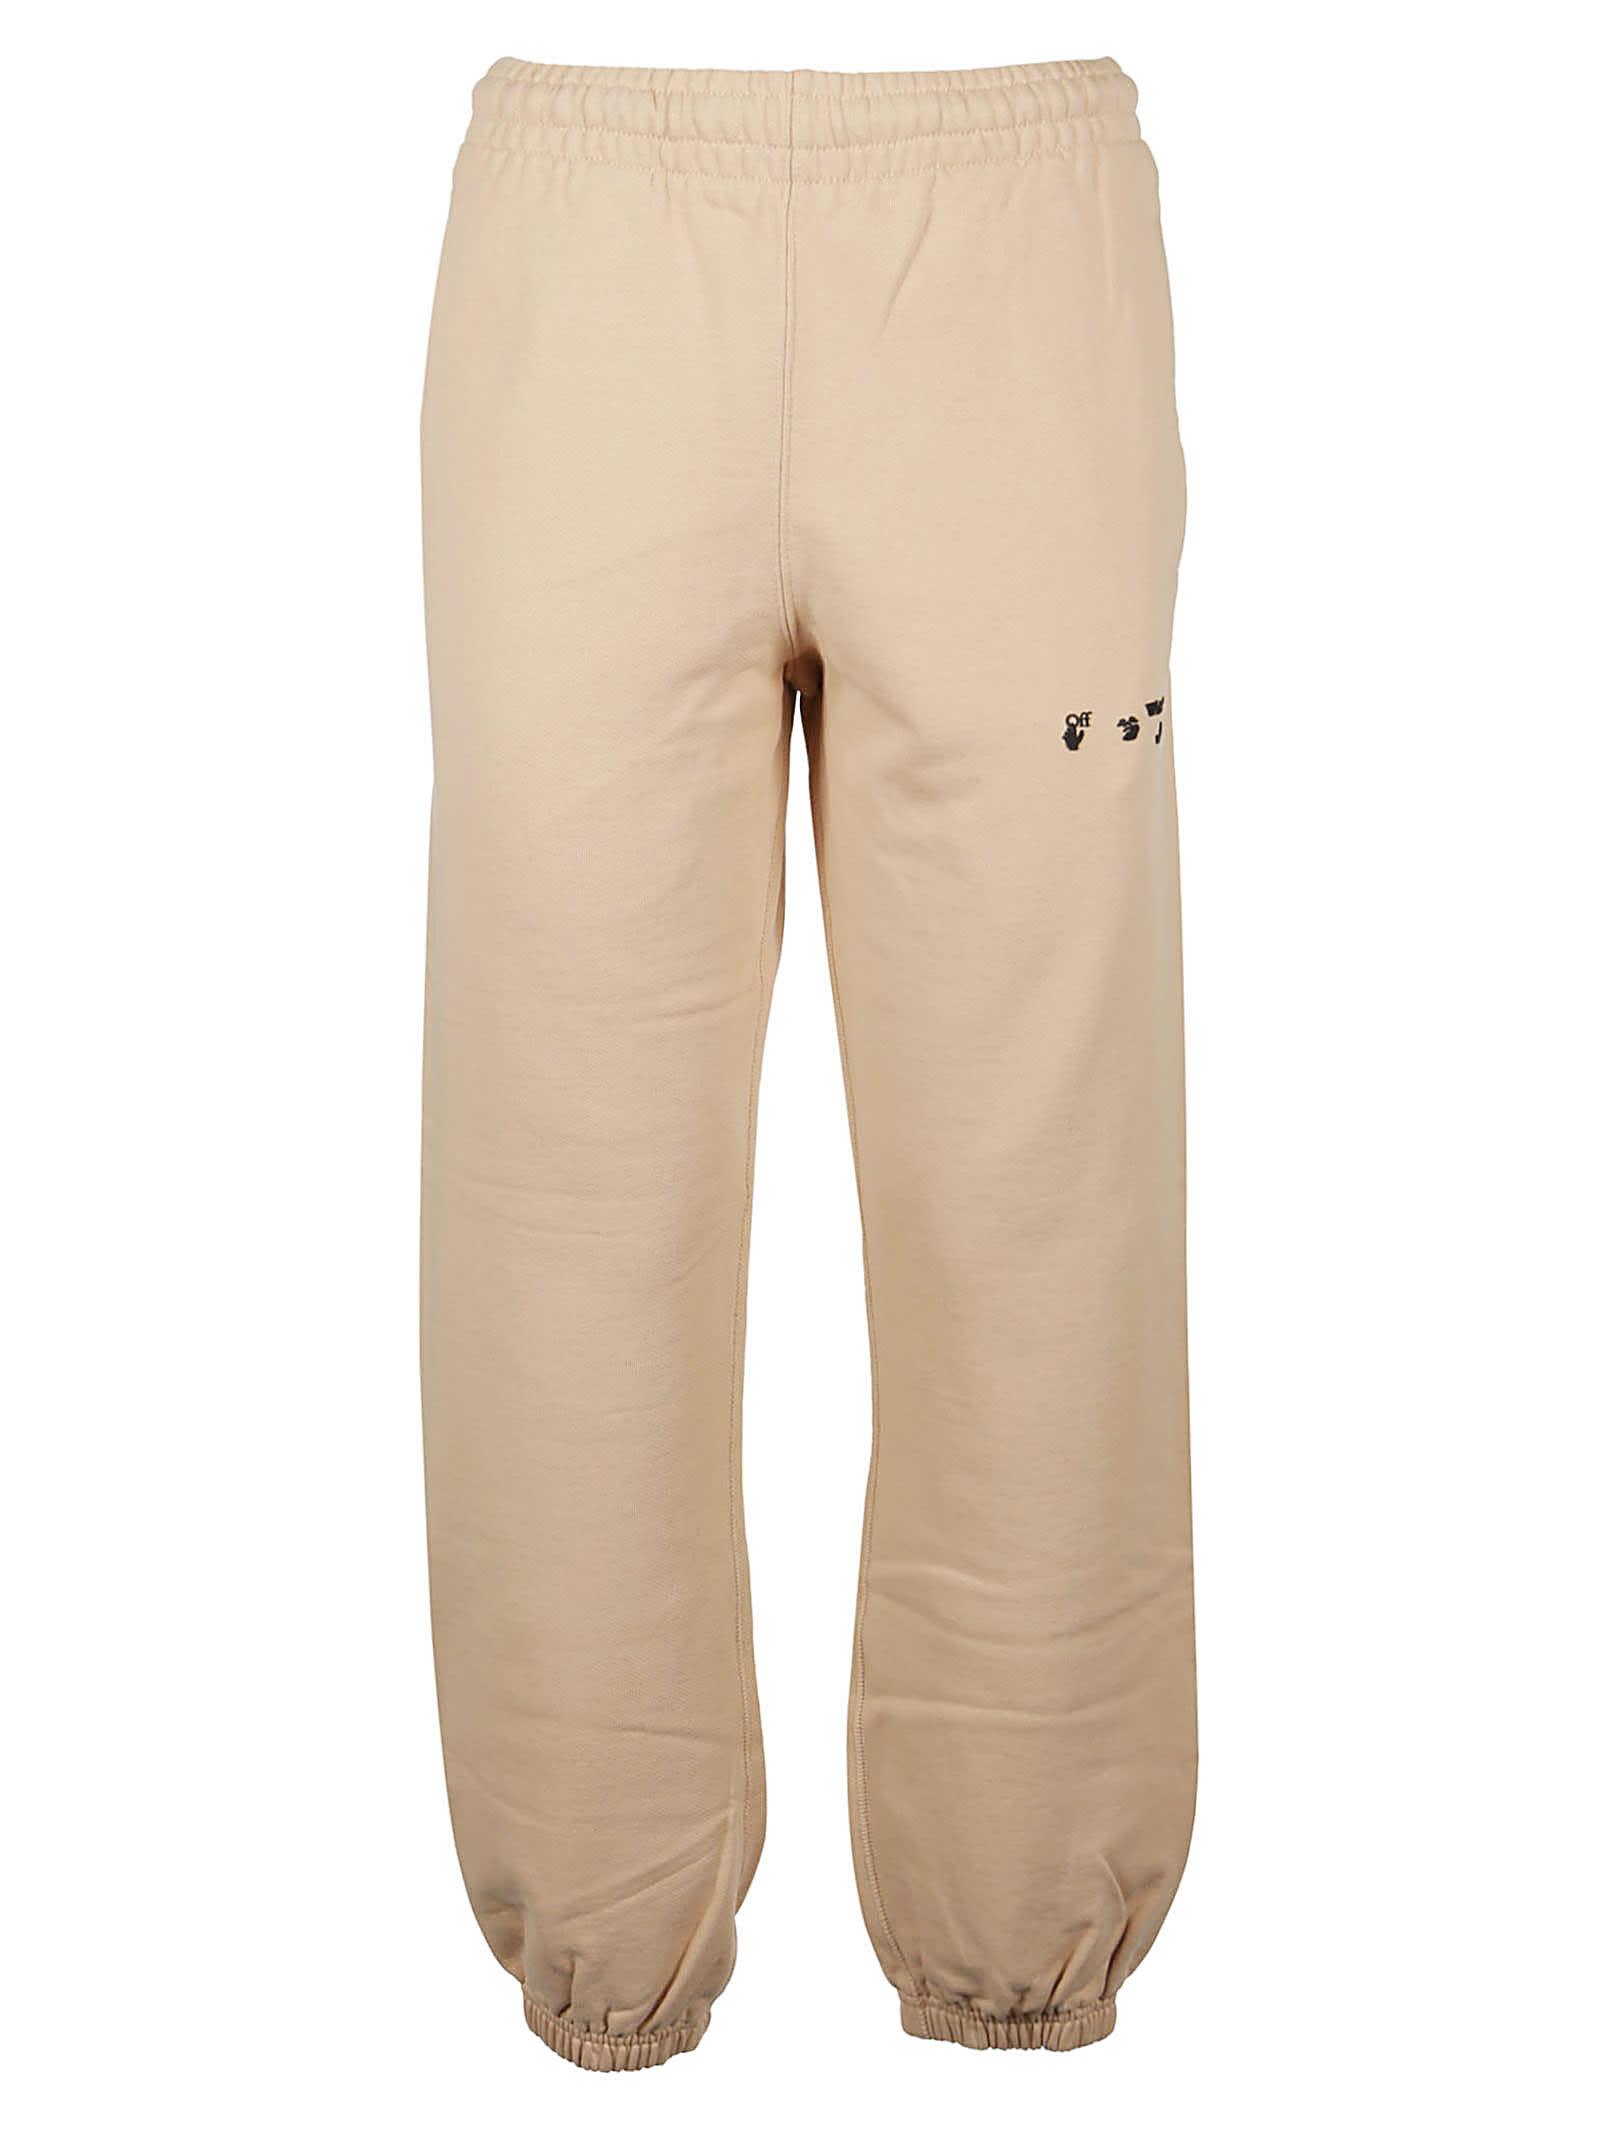 Off-White Clothing SWEAT PANT SLIM OW LOGO